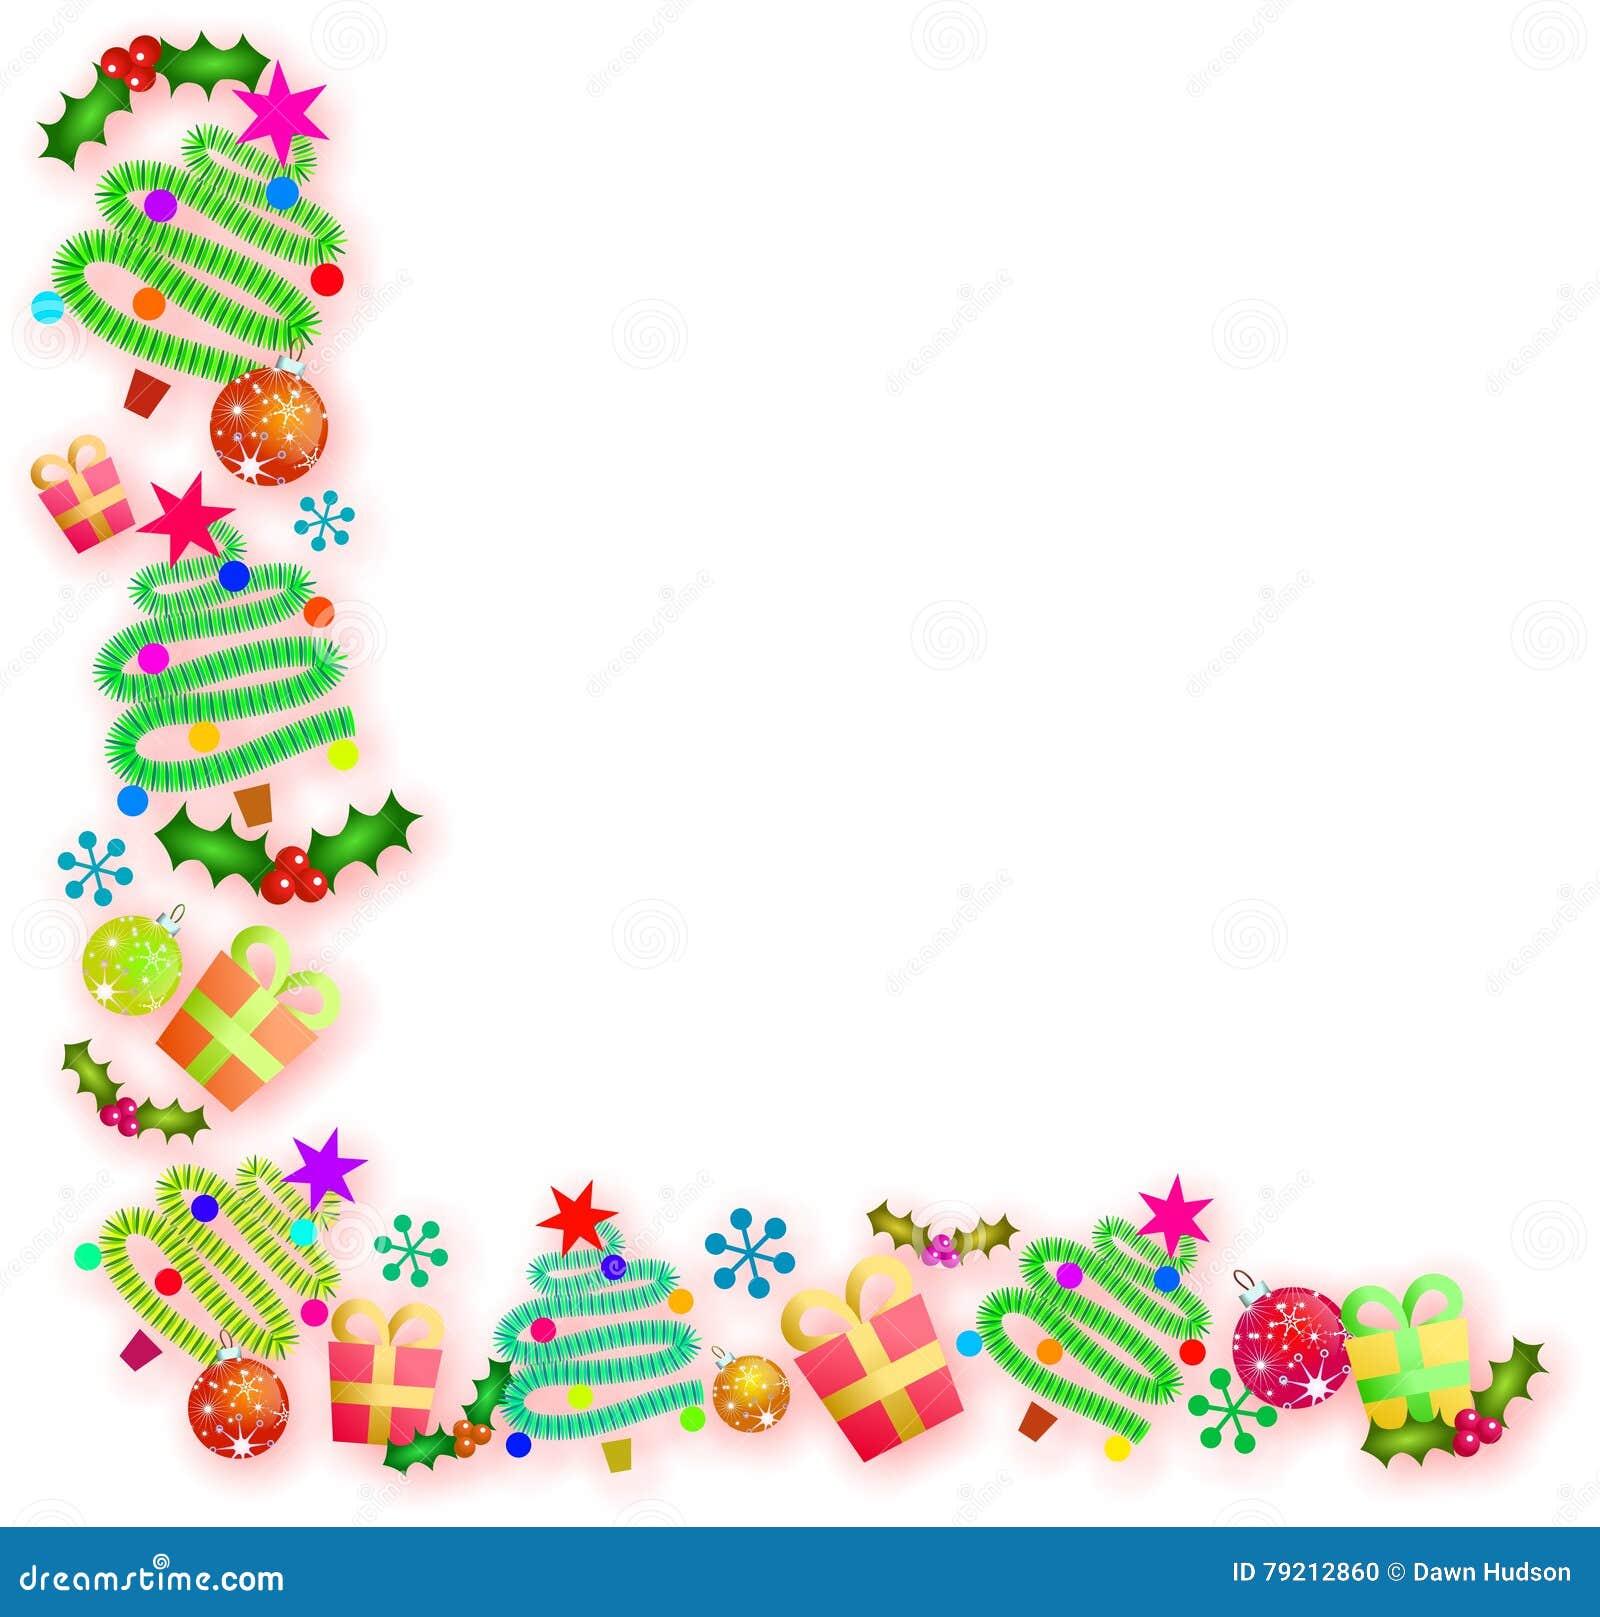 Christmas Corner Border Stock Illustration - Image: 79212860